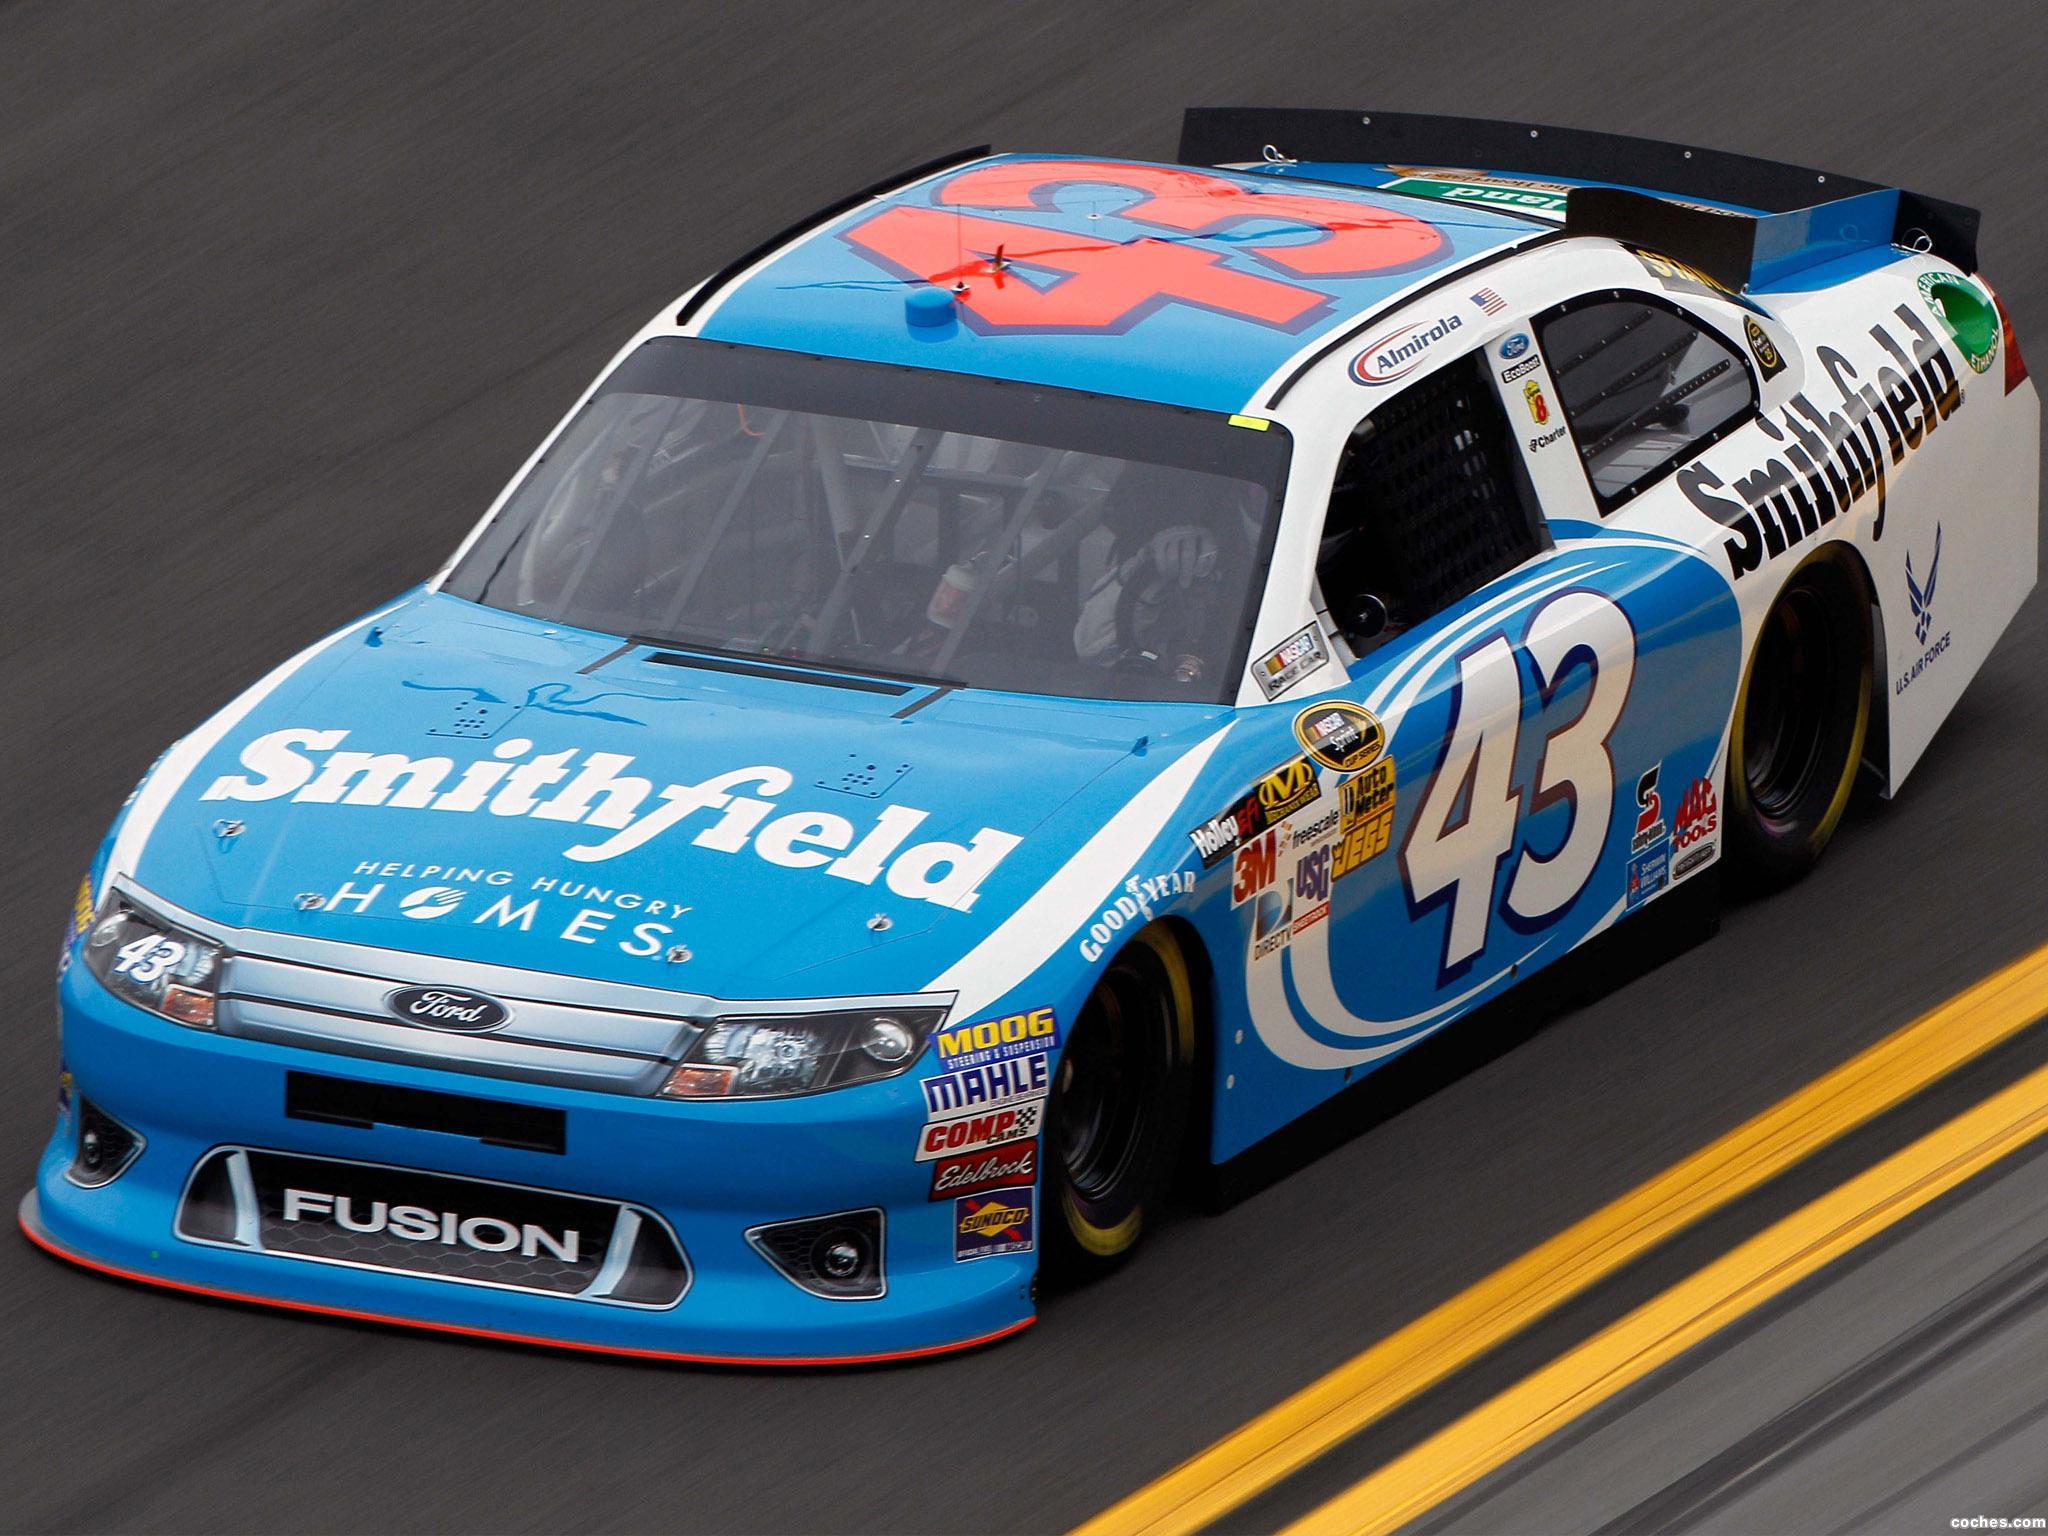 Foto 3 de Ford Fusion NASCAR Sprint Cup Series Race Car 2012